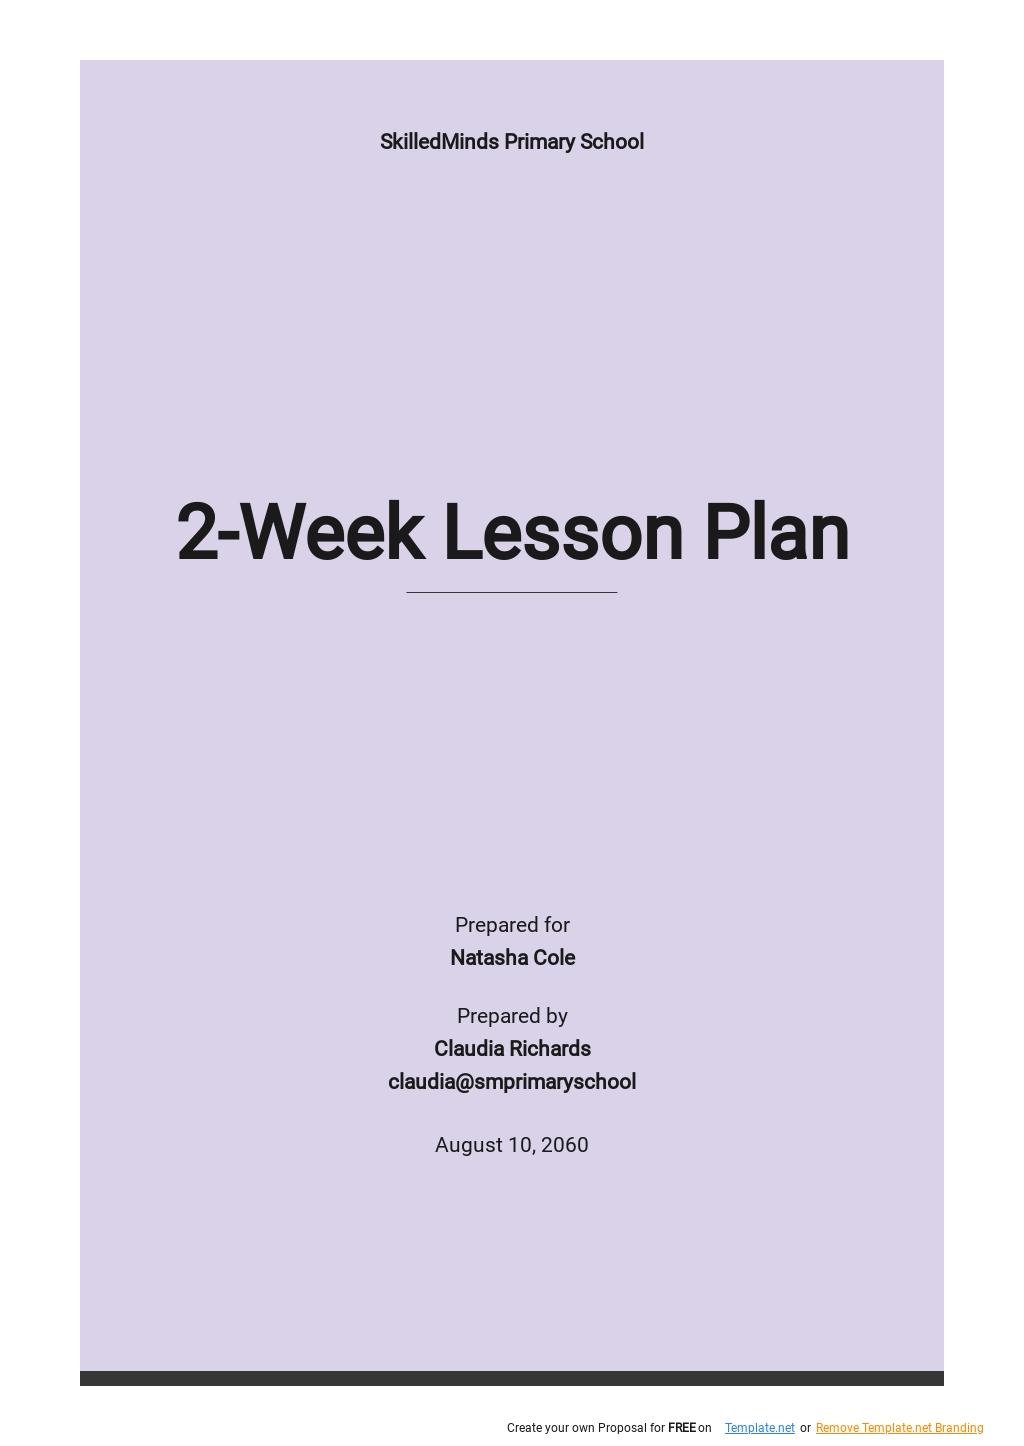 Blank 2 Week Lesson Plan Template .jpe